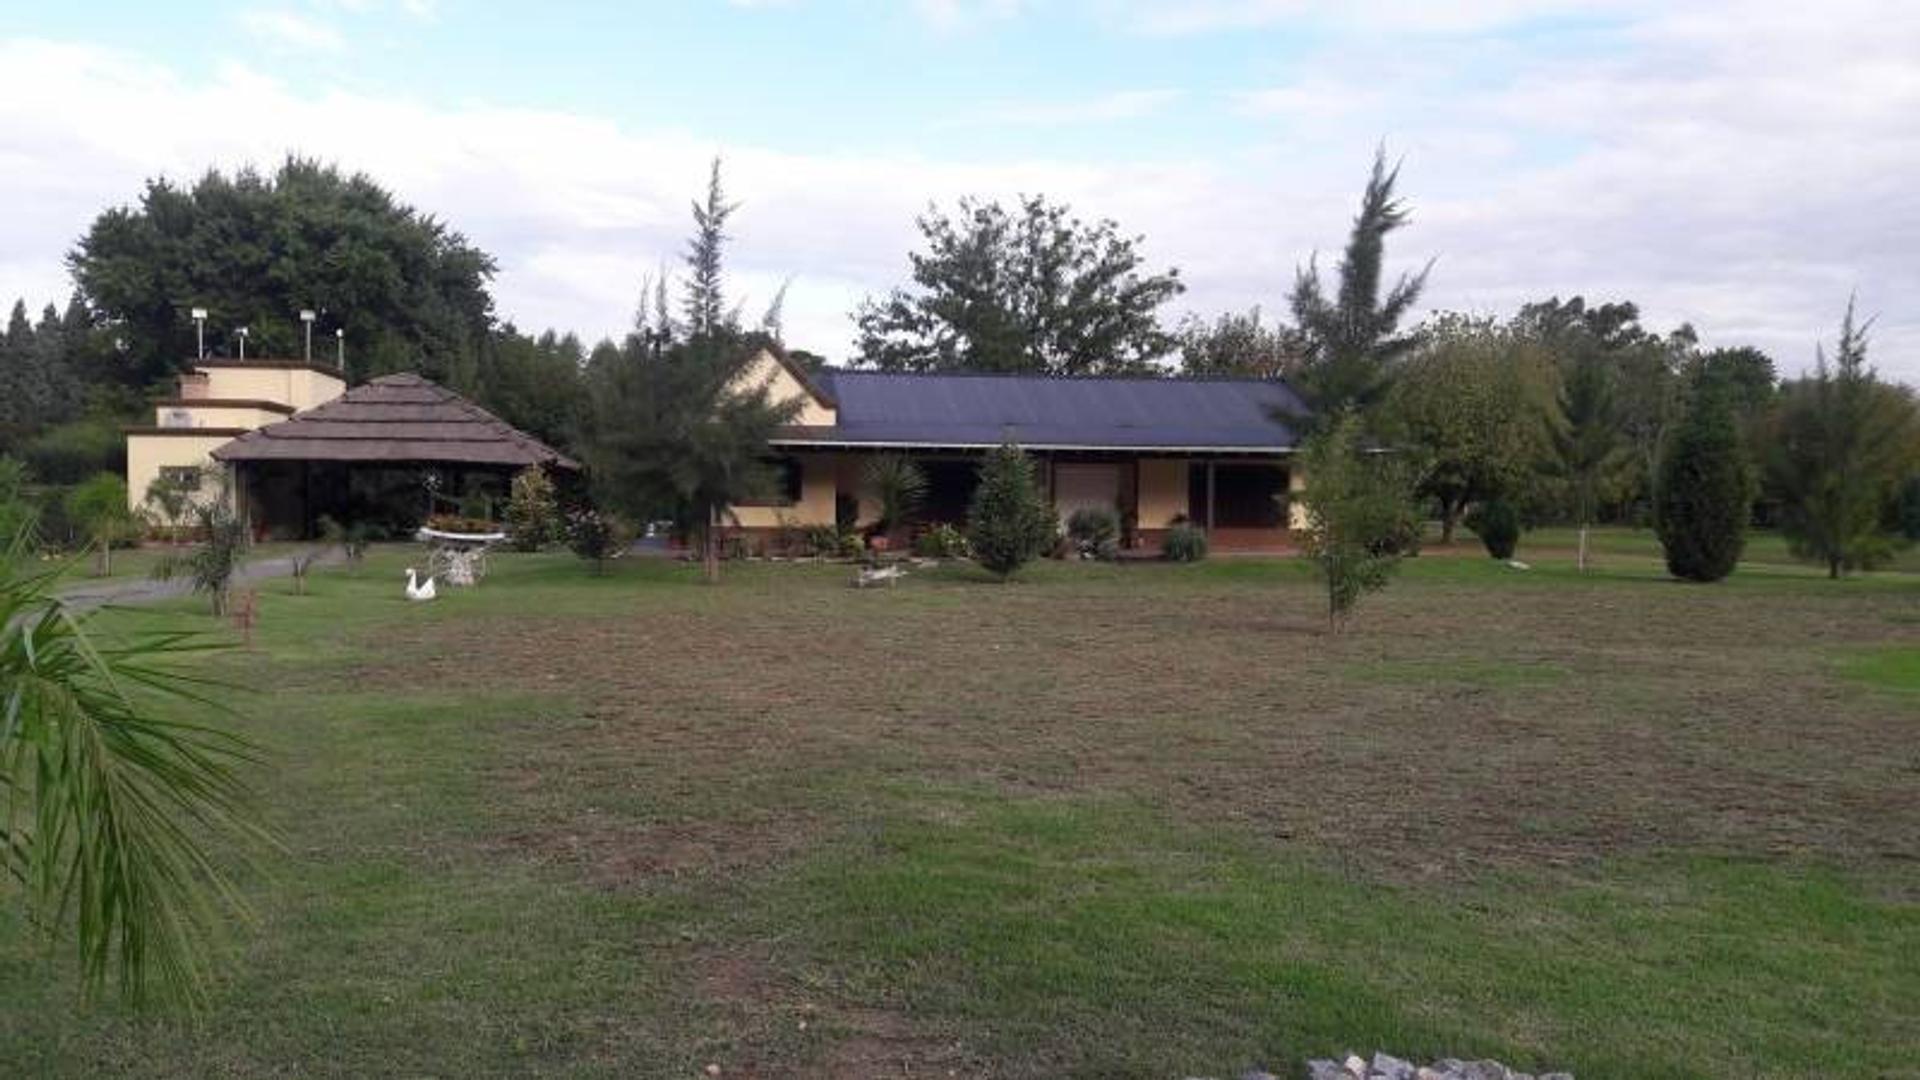 Venta de Lote en Amancay zona Pilar, Gran Bs.As., Argentina